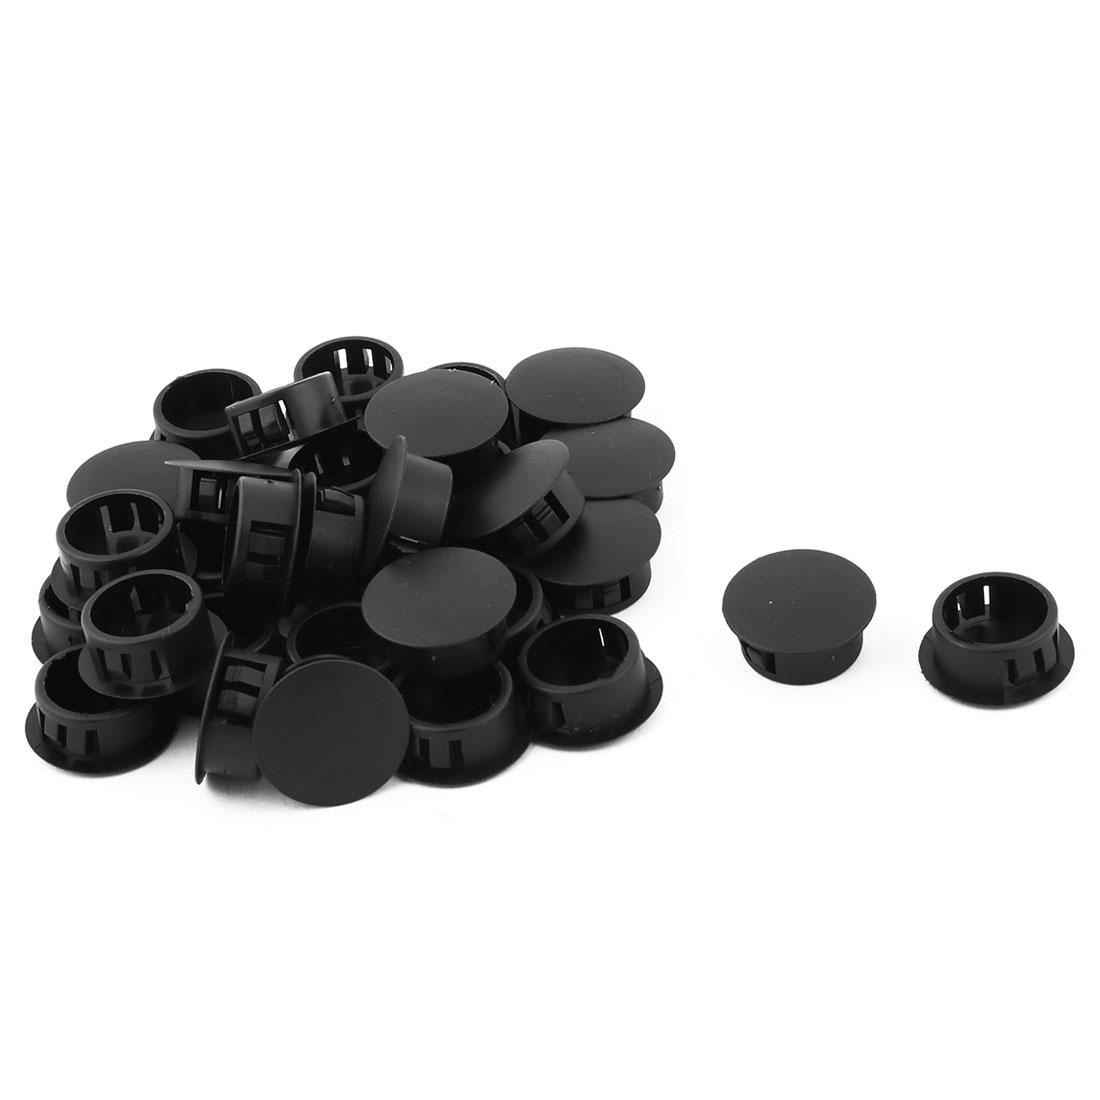 Plastic Round Design Chair Leg Protector Hole Stopper 20mm Diameter 32pcs